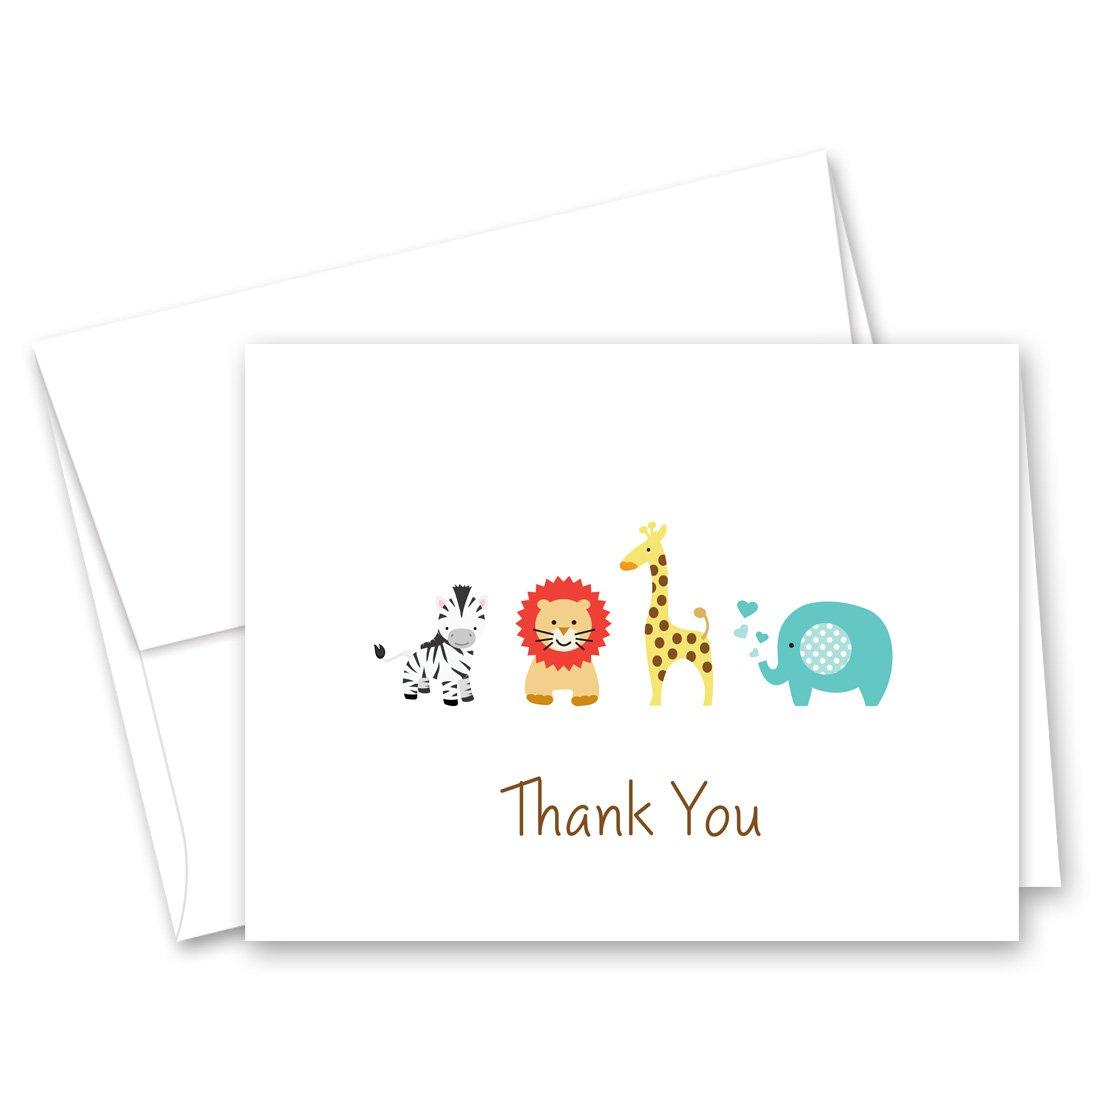 50 Safari Animals Baby Shower Thank You Cards (White)